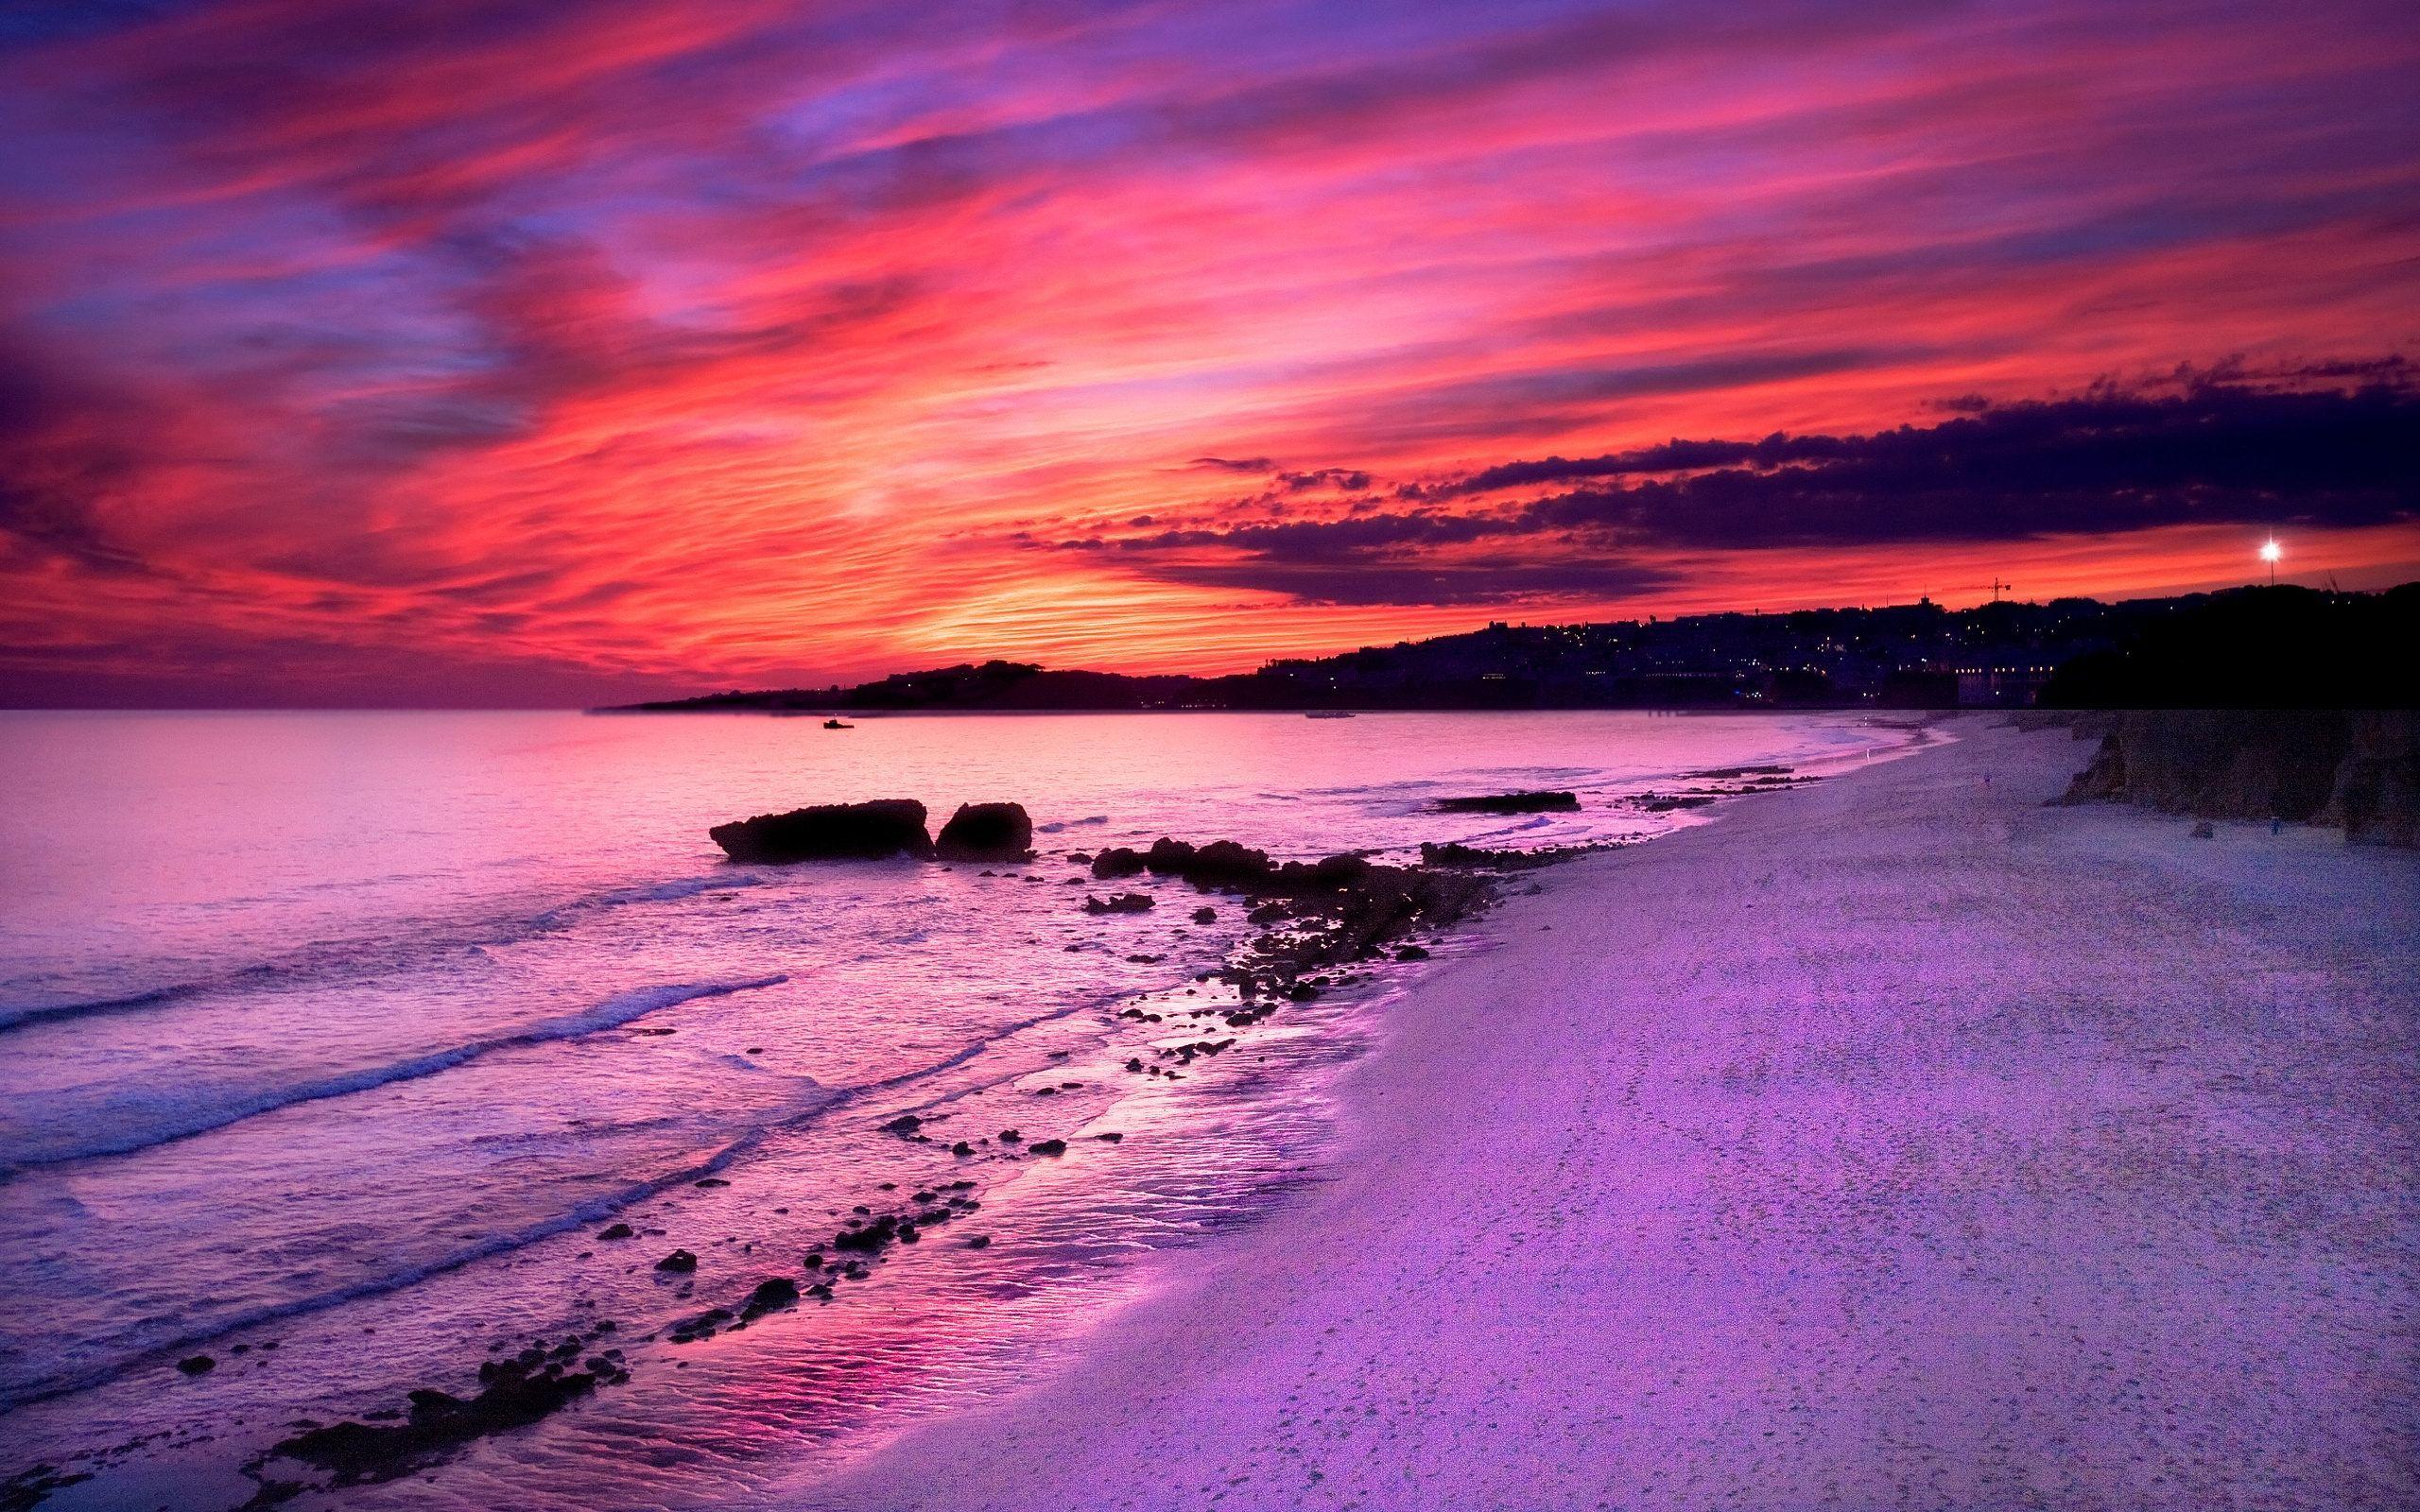 beautiful beach scenery car girl beach sunset scenery